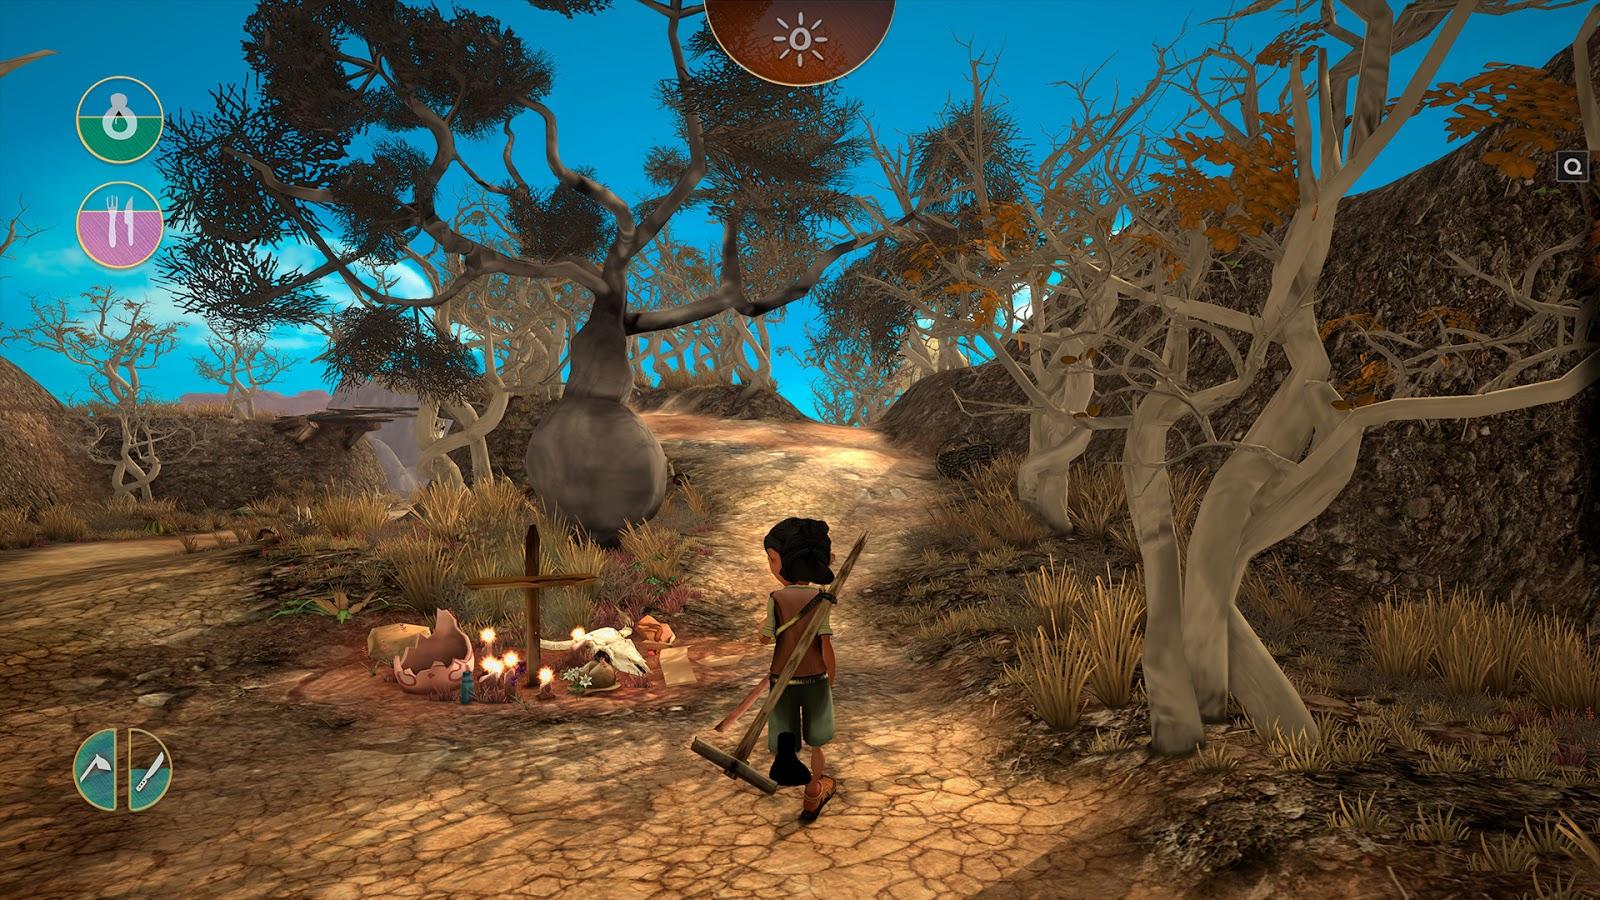 arida-backlands-awakening-pc-screenshot-01